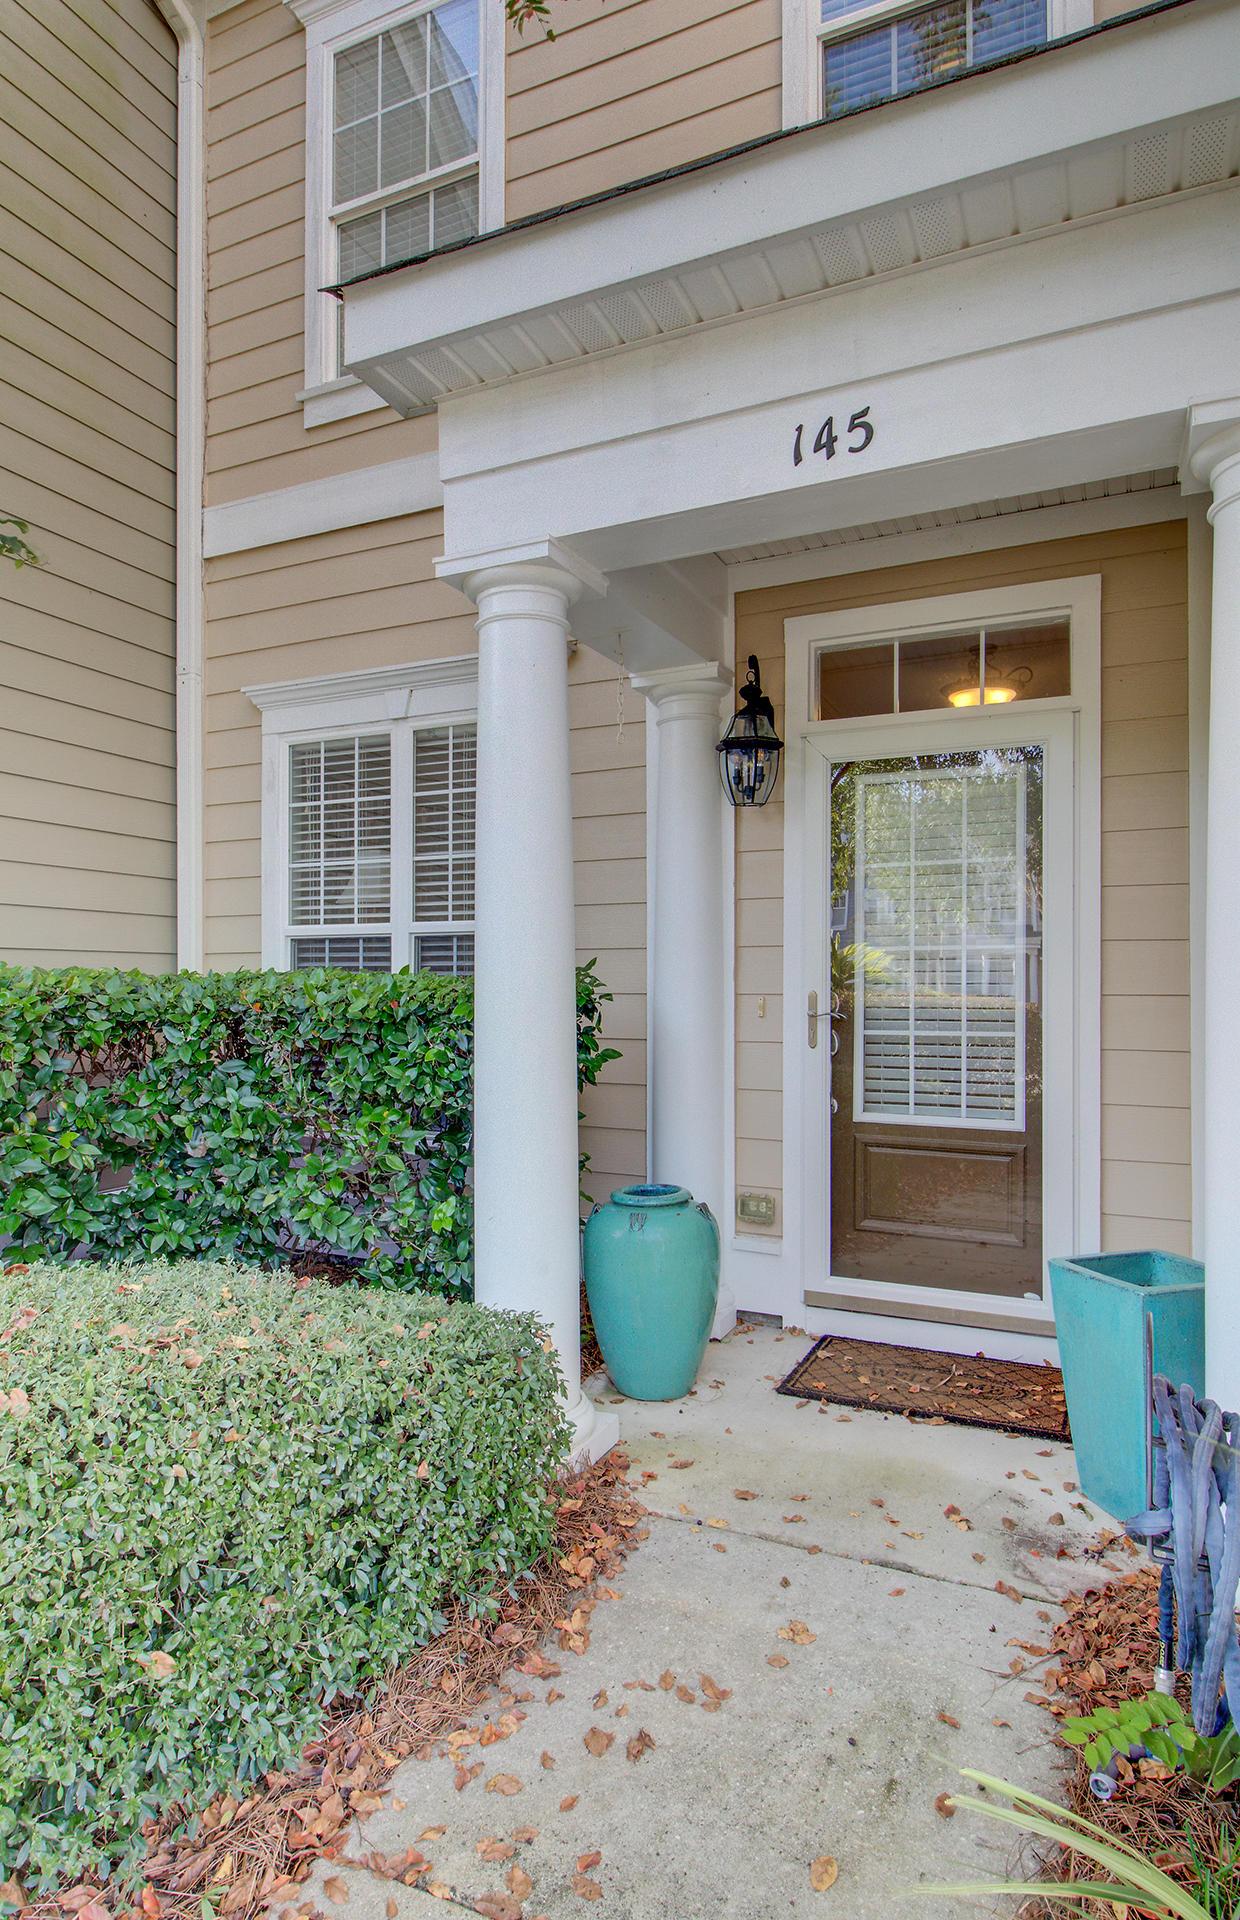 Dunes West Homes For Sale - 145 Fresh Meadow, Mount Pleasant, SC - 4